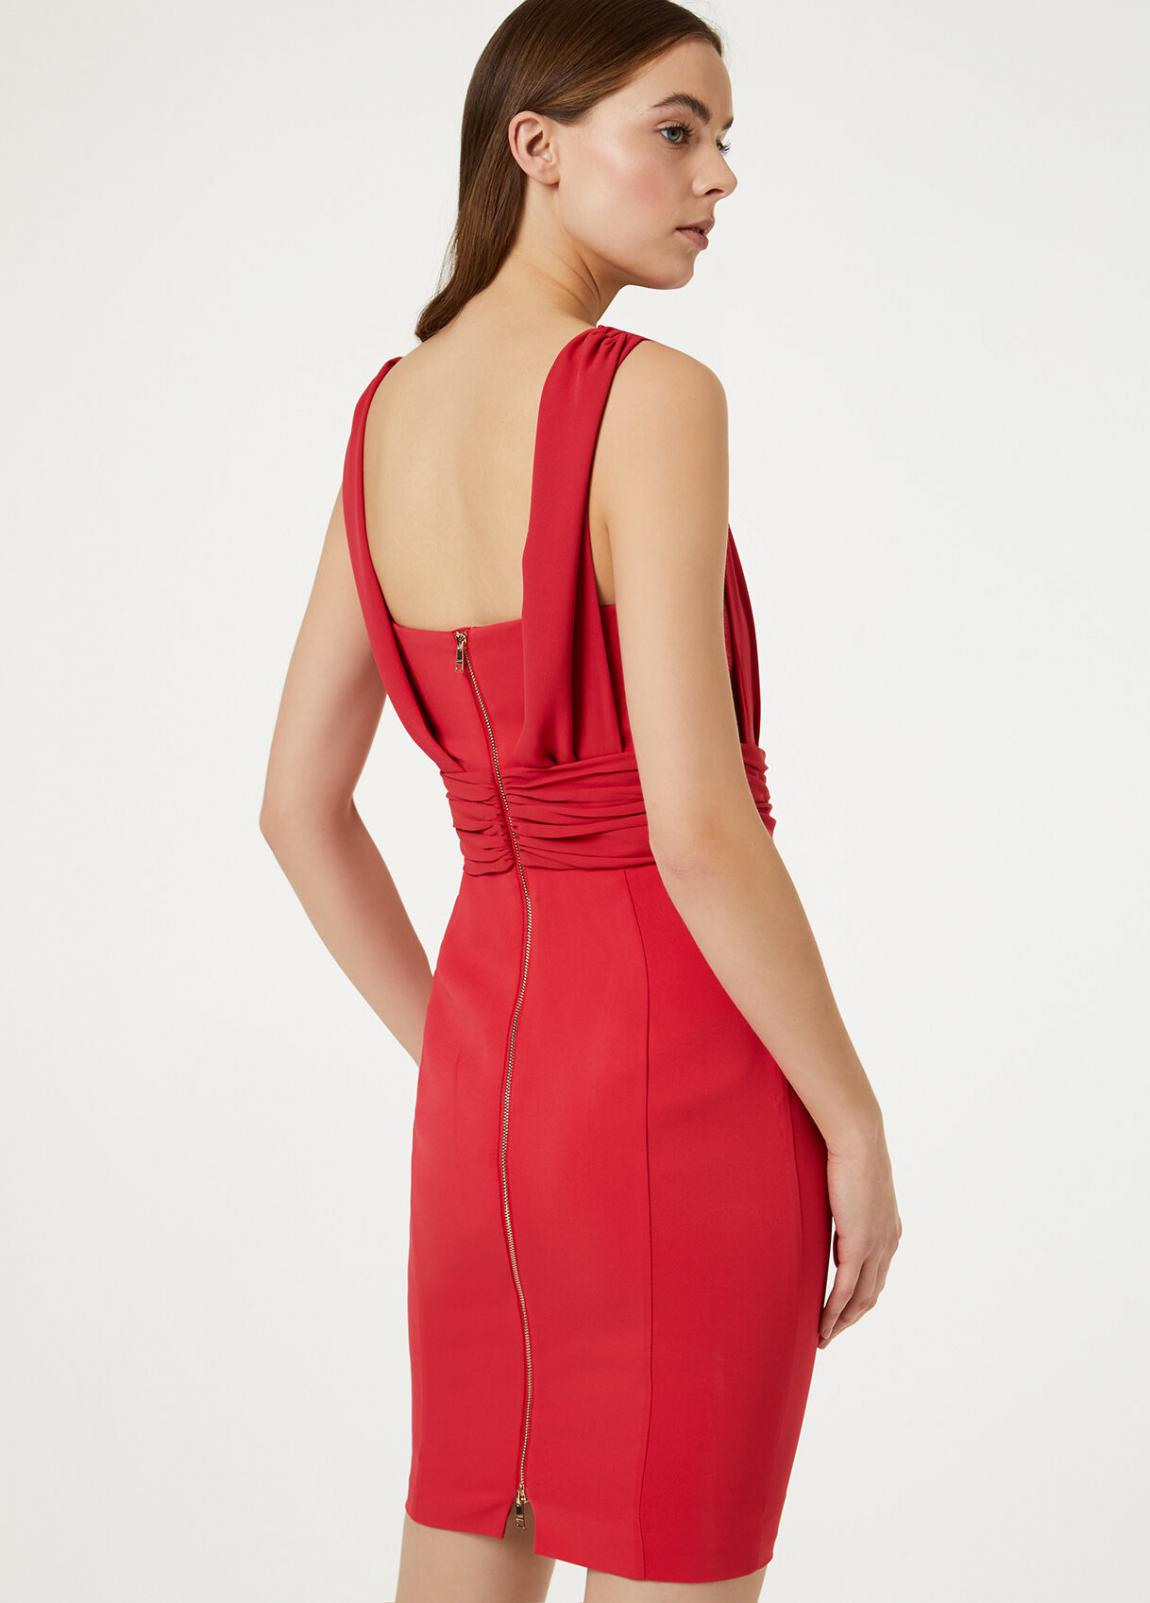 Damen Kurzes Kleid Mit Reißverschluss  Liu Jo Kleider